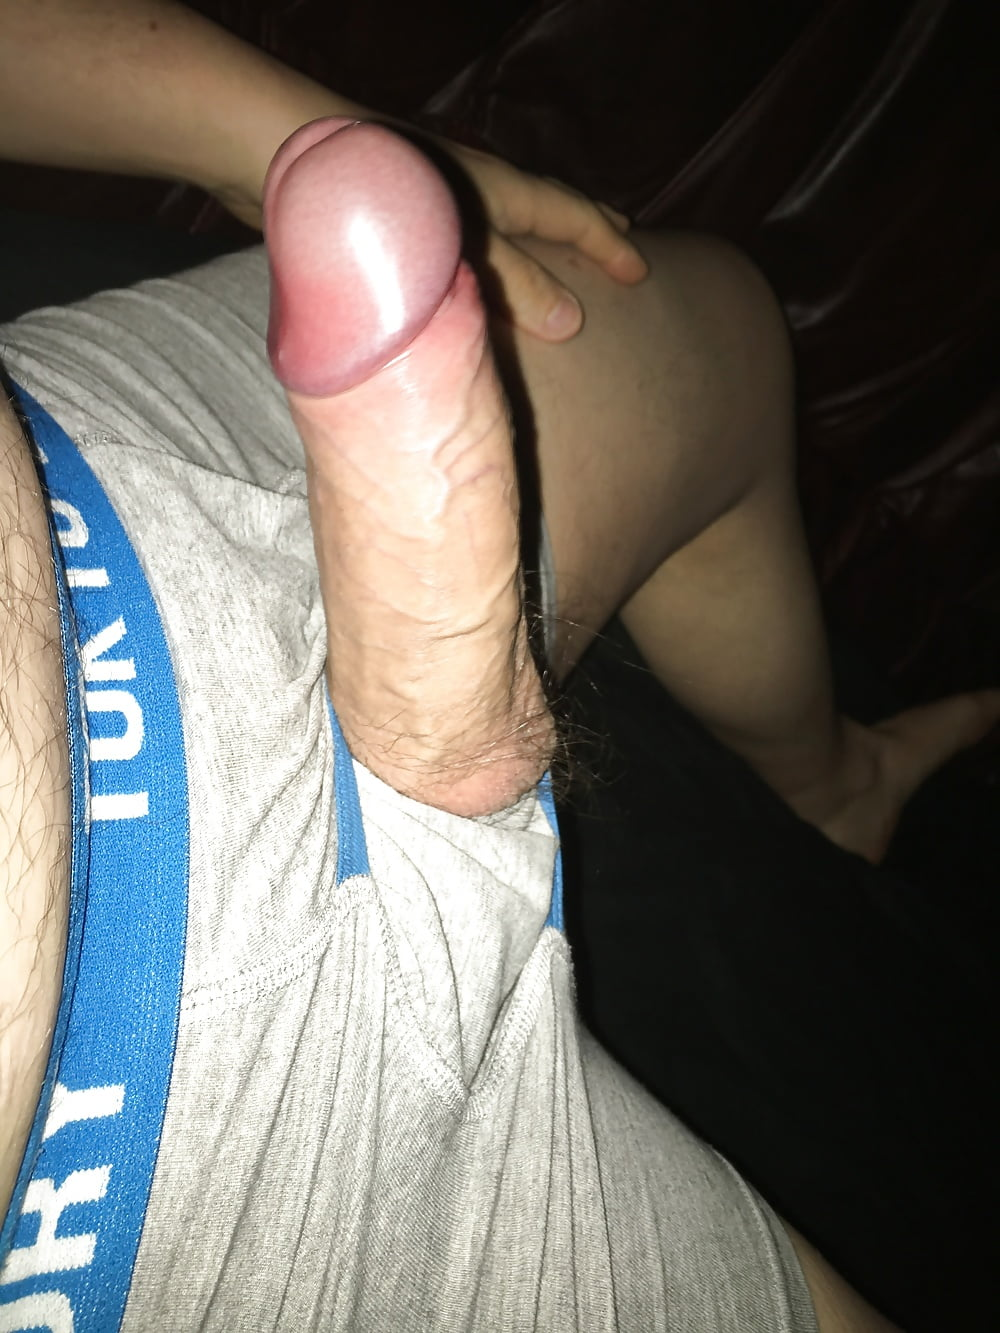 My Night Cock